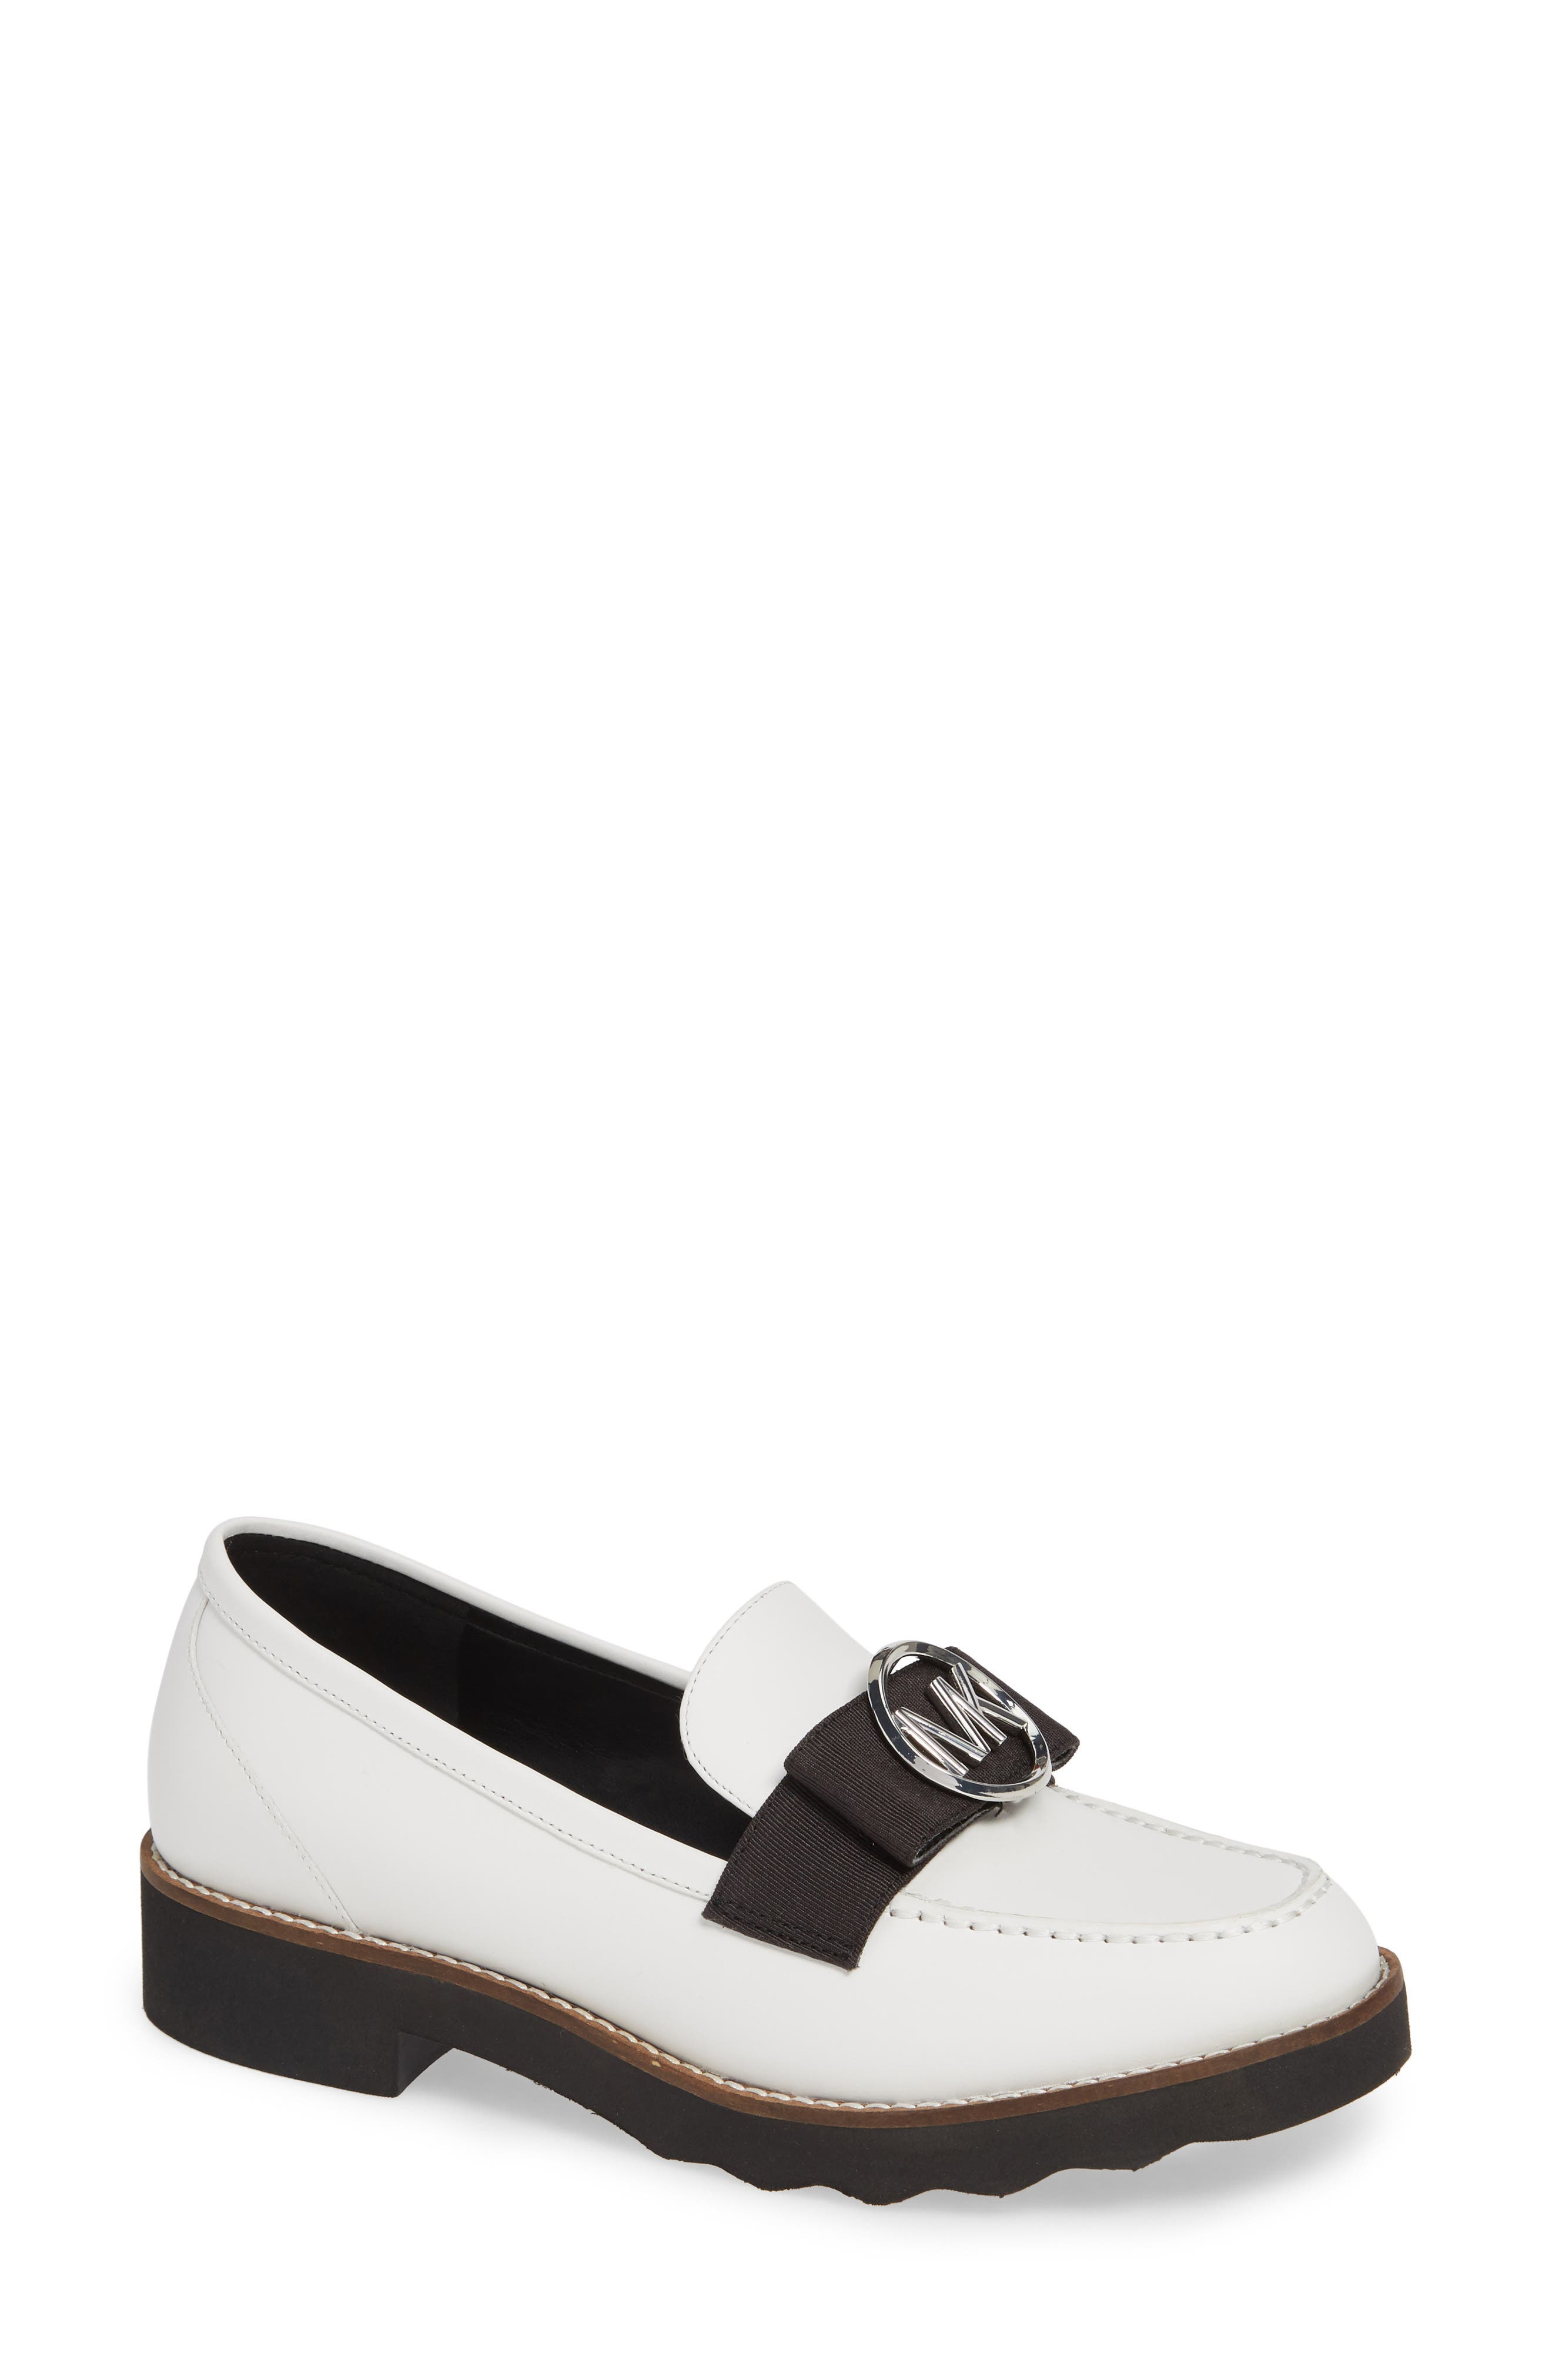 Aden Loafer in White Vachetta Leather